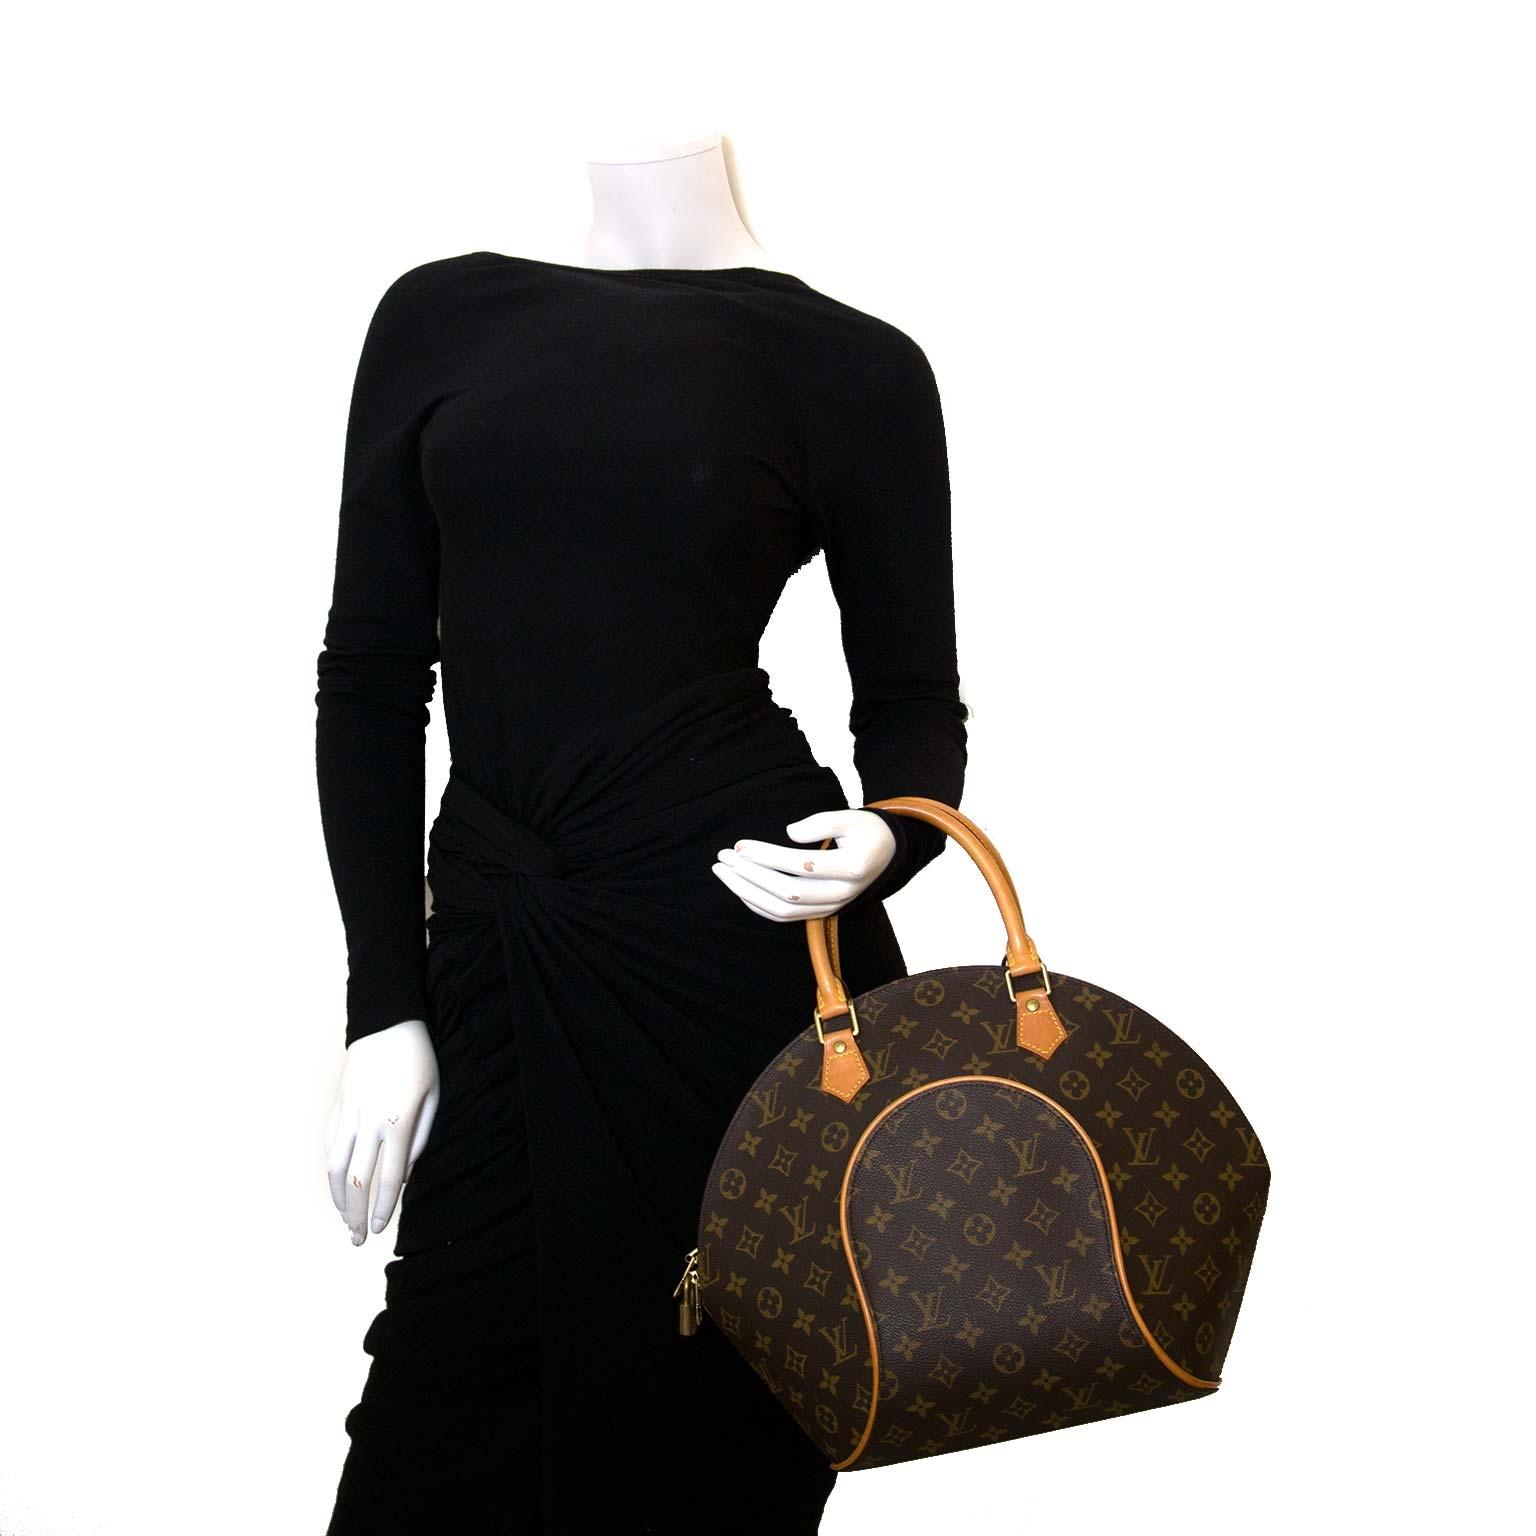 acdd3e8479a ... Louis Vuitton Monogram Canvas Ellipse Bag koop veilig online tegen de  beste prijs Louis Vuitton Monogram